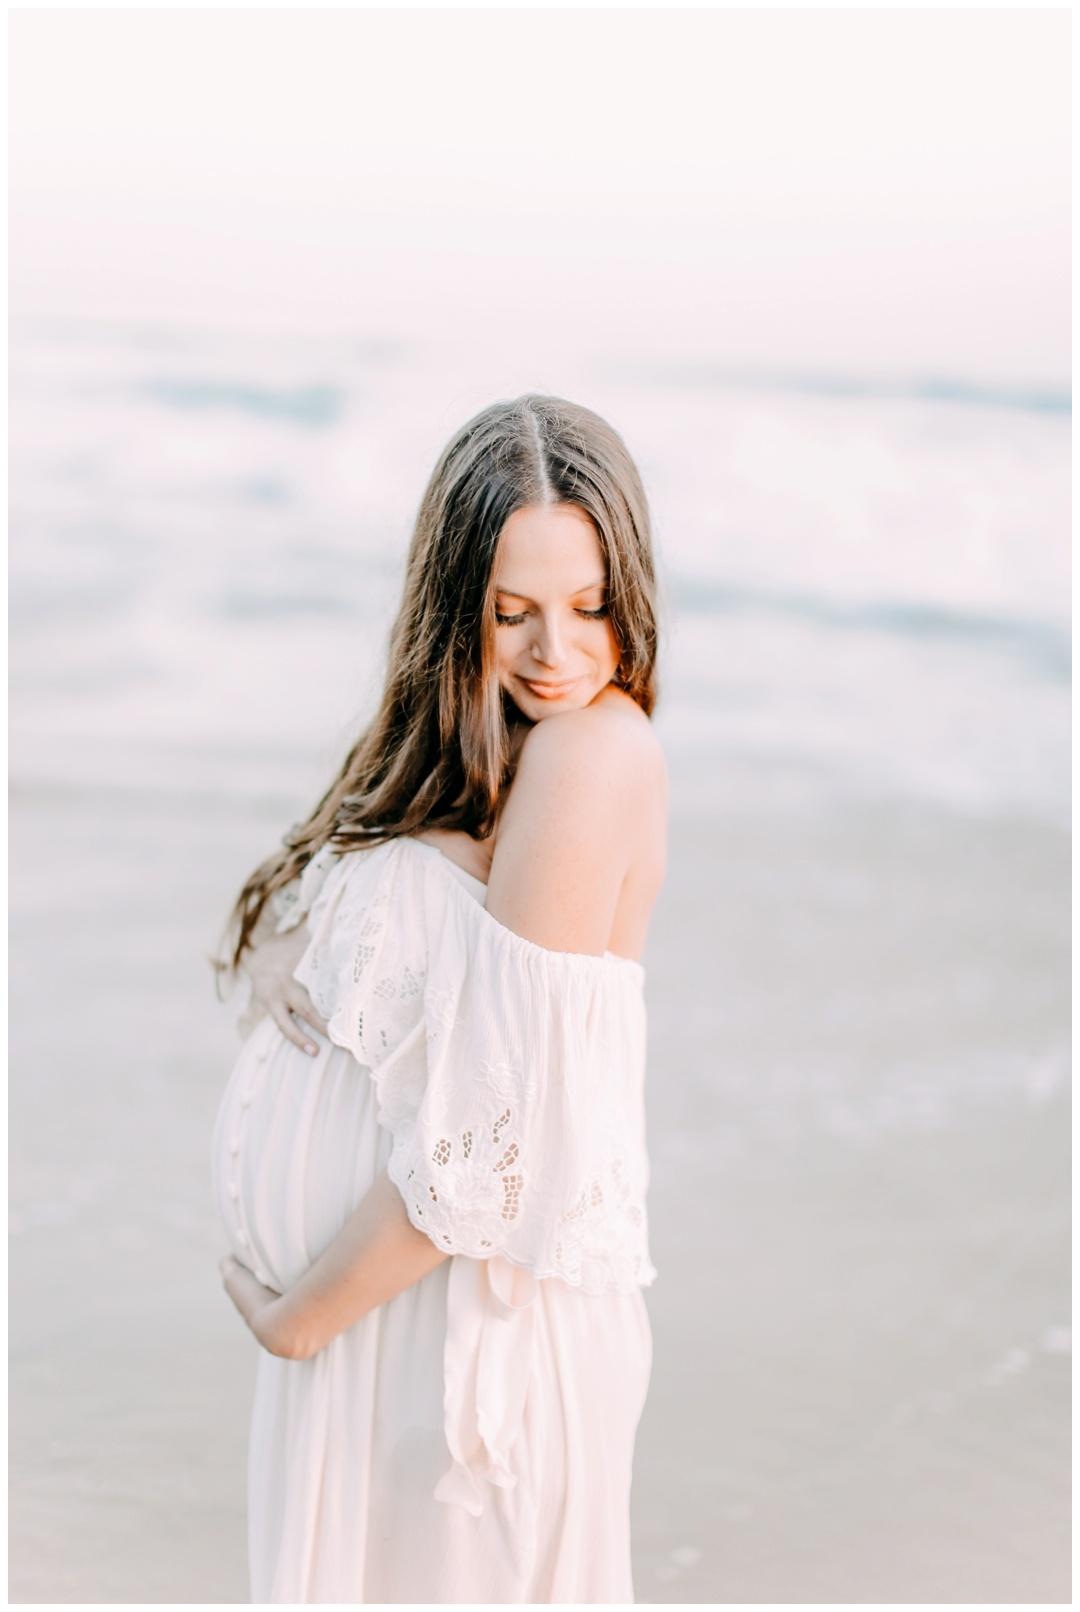 Newport_Beach_Maternity_Photographer_Beach_Maternity_Photography_Cori_Kleckner_Photography_1010.jpg